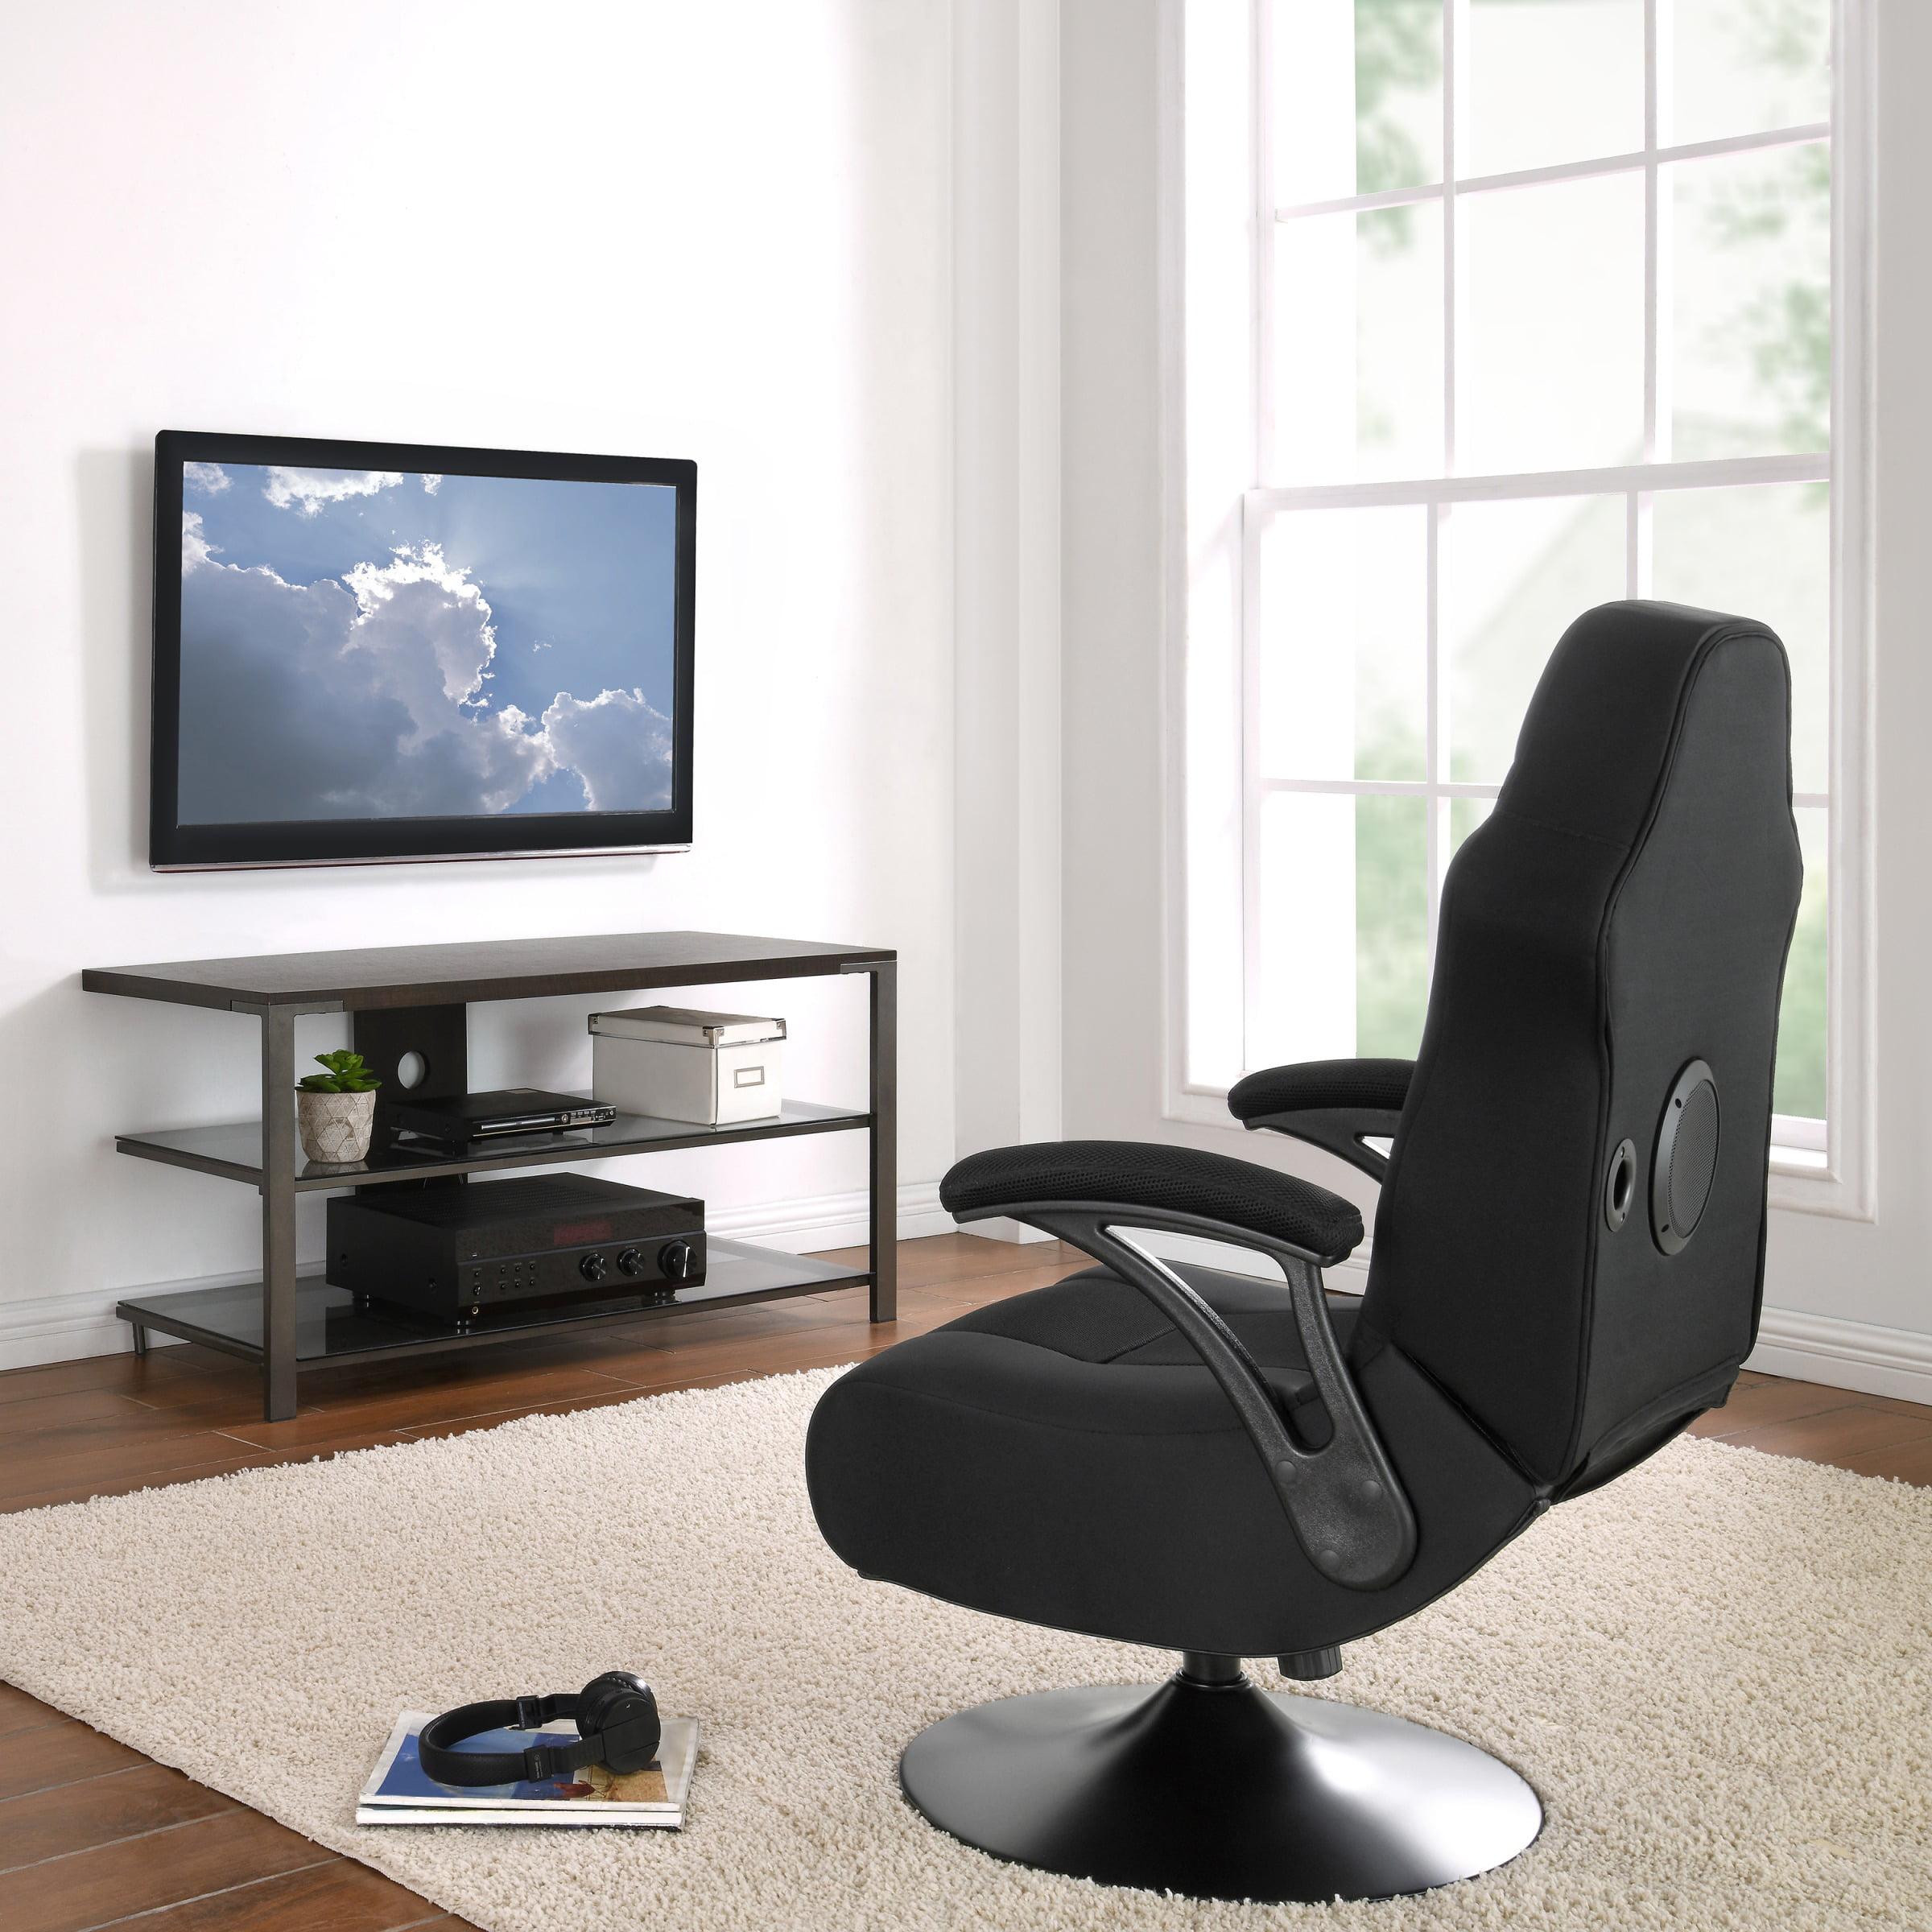 Pleasing X Rocker X Pro 300 Black Pedestal Gaming Chair Rocker With Ibusinesslaw Wood Chair Design Ideas Ibusinesslaworg